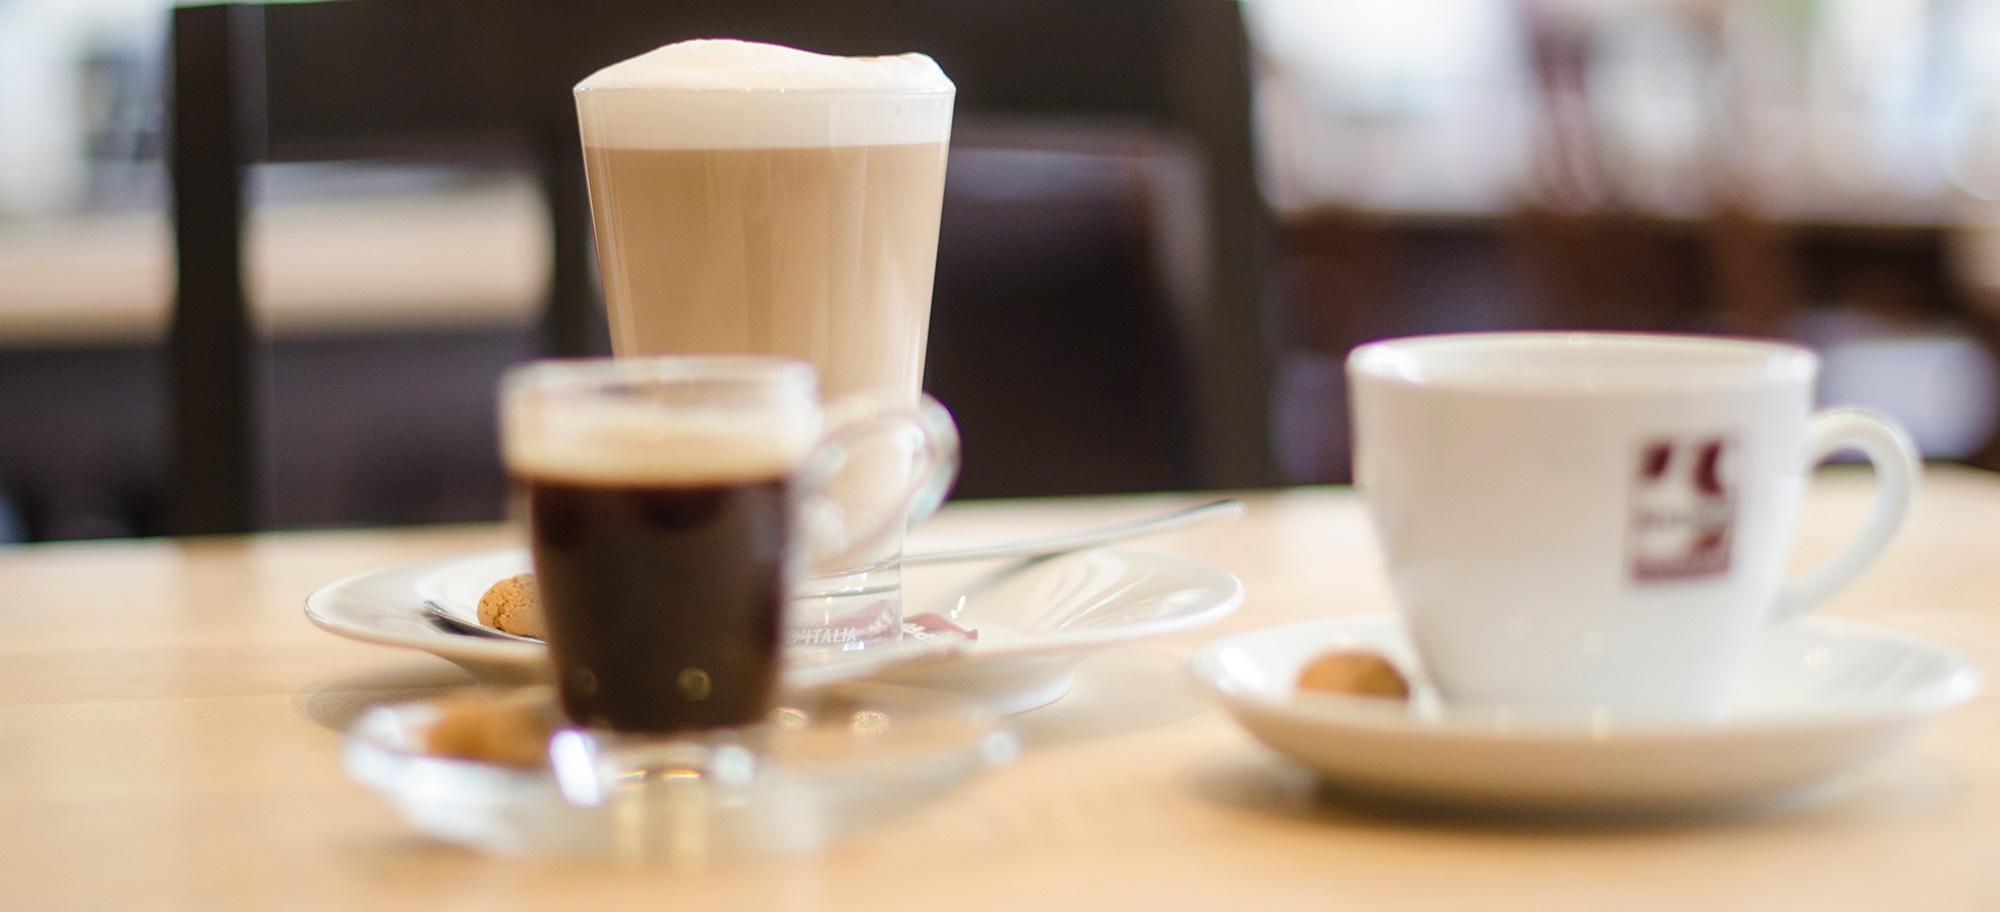 kaffee_schmal